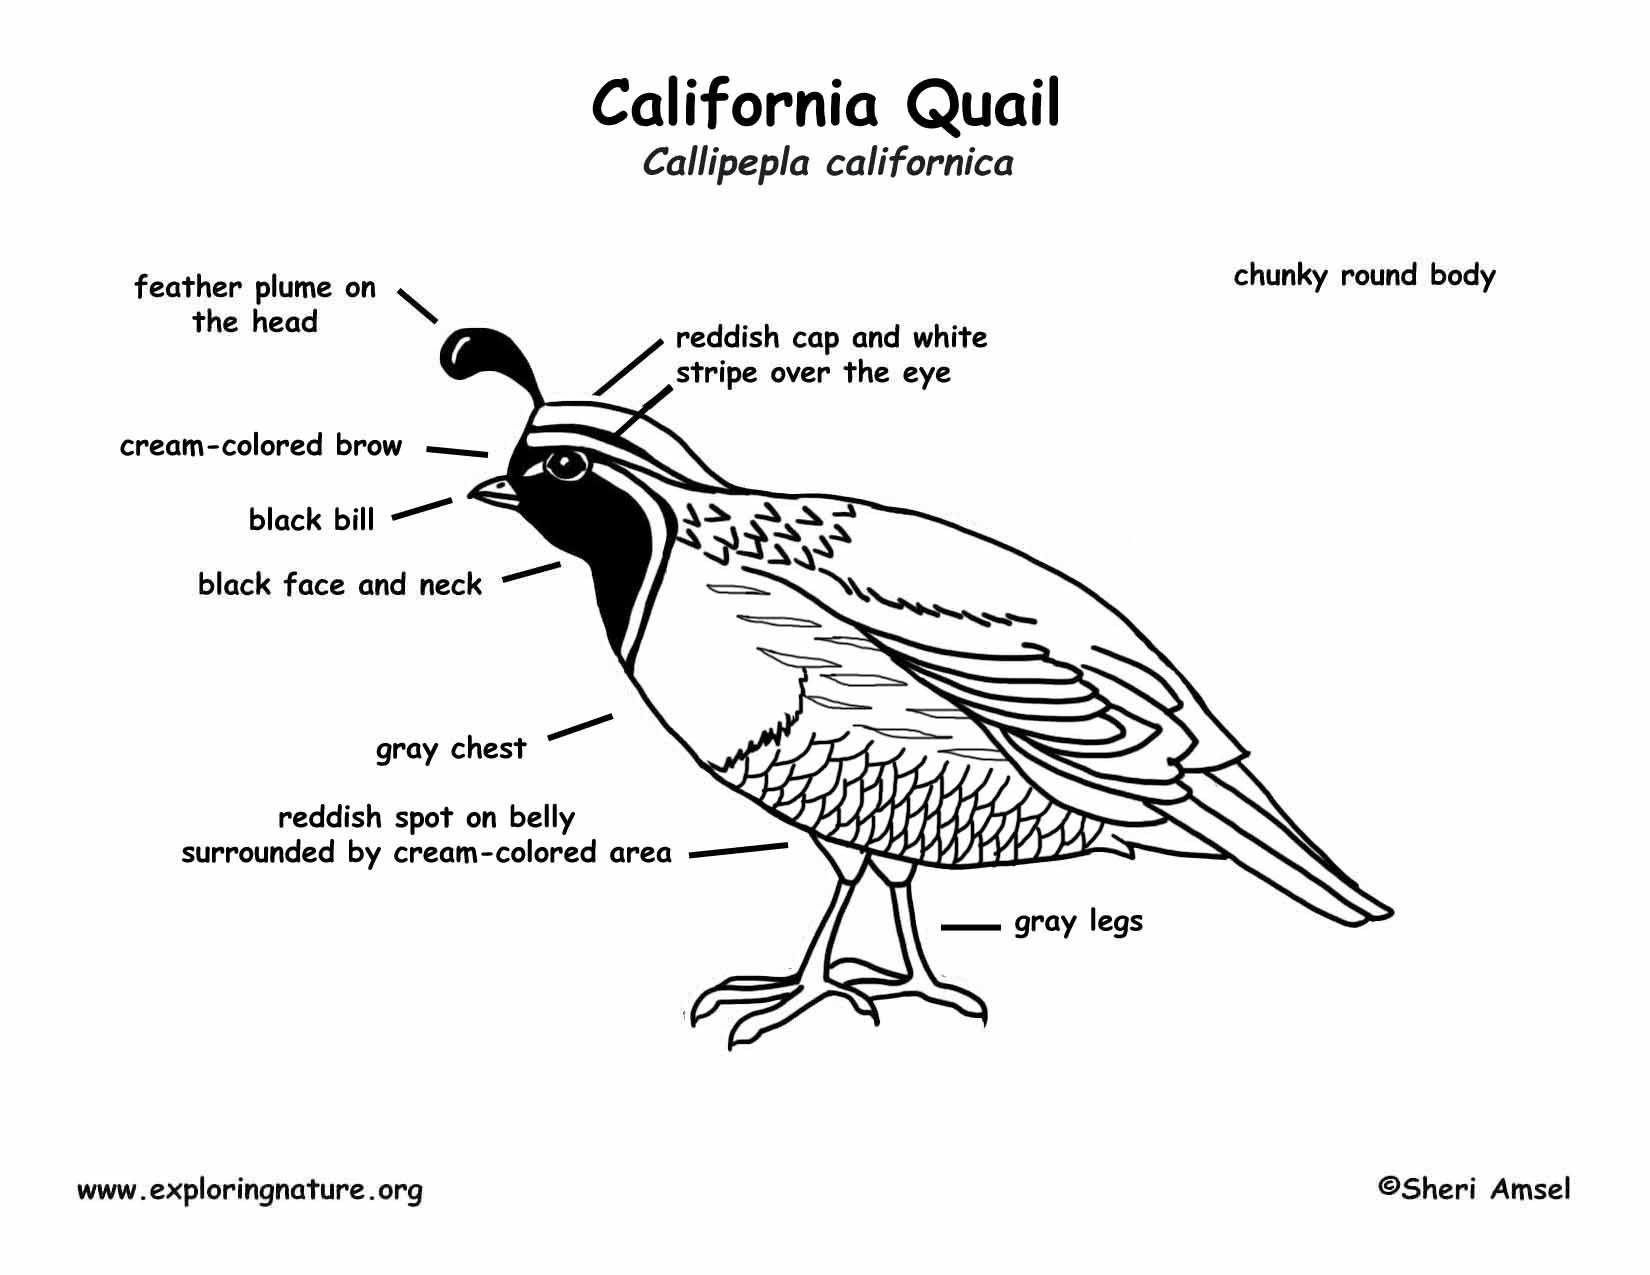 Quail (California)